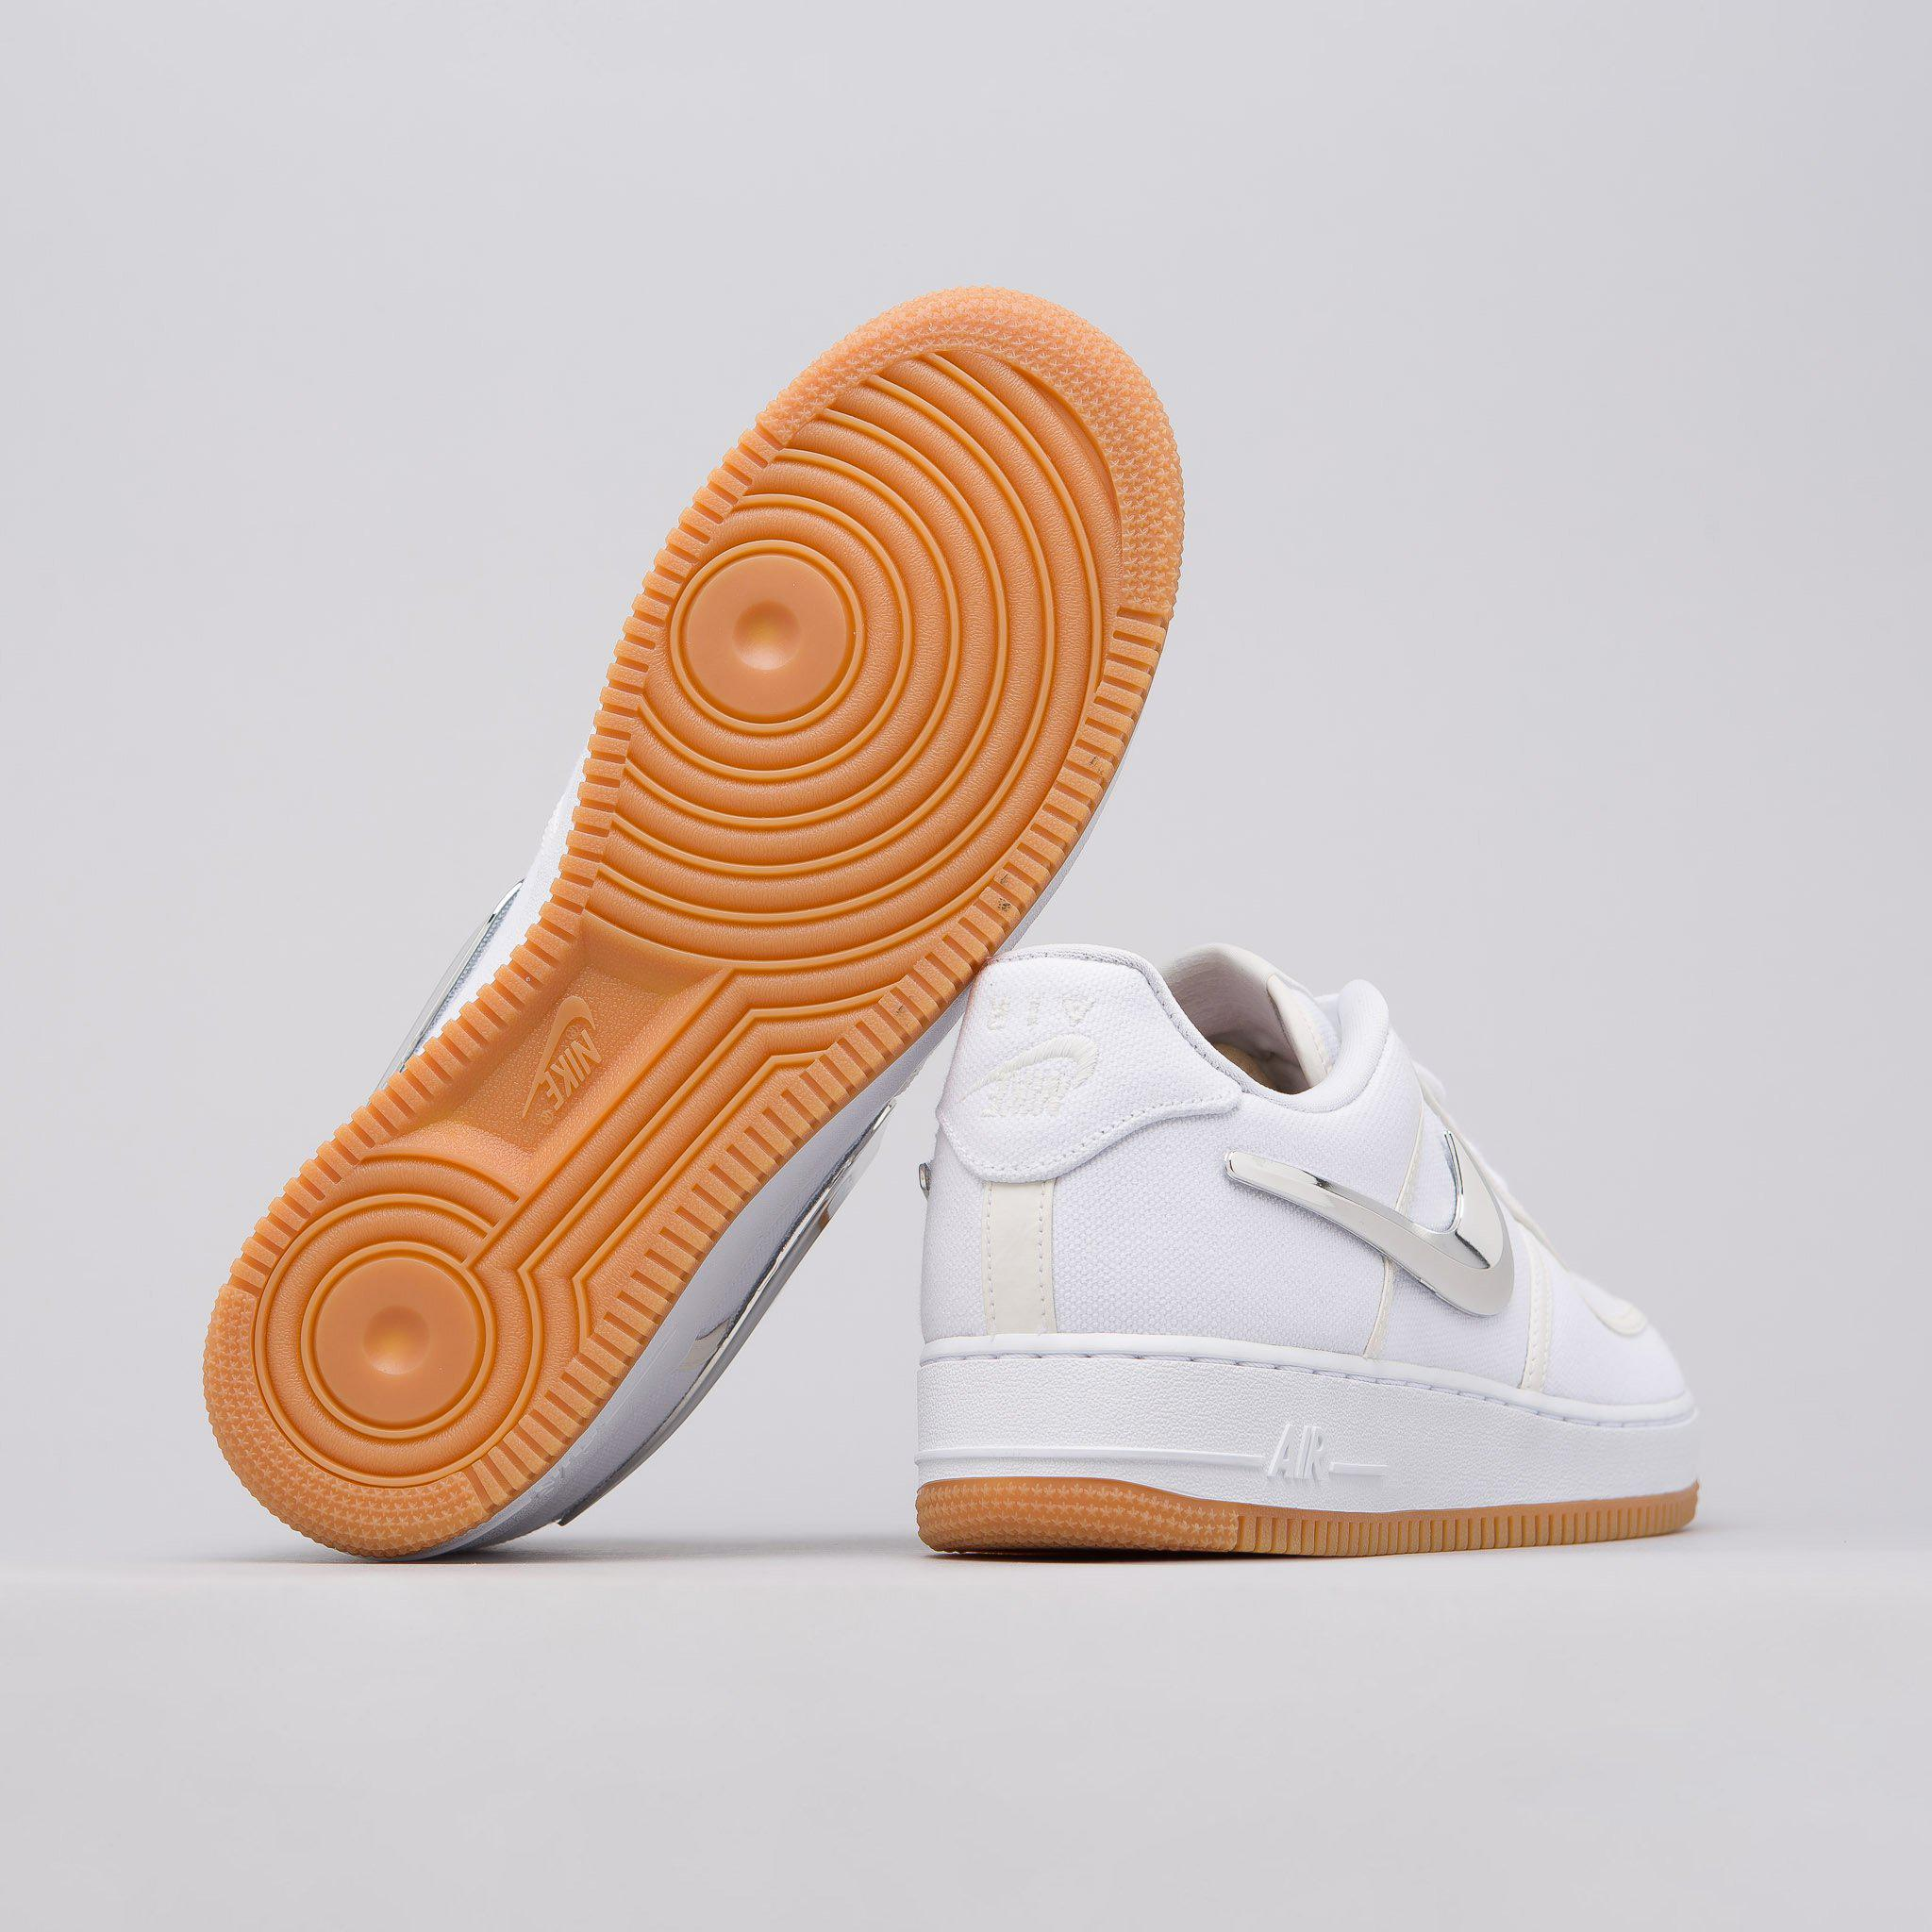 dca9b0b0047111 Nike X Travis Scott Air Force 1 Low In White in White for Men - Lyst